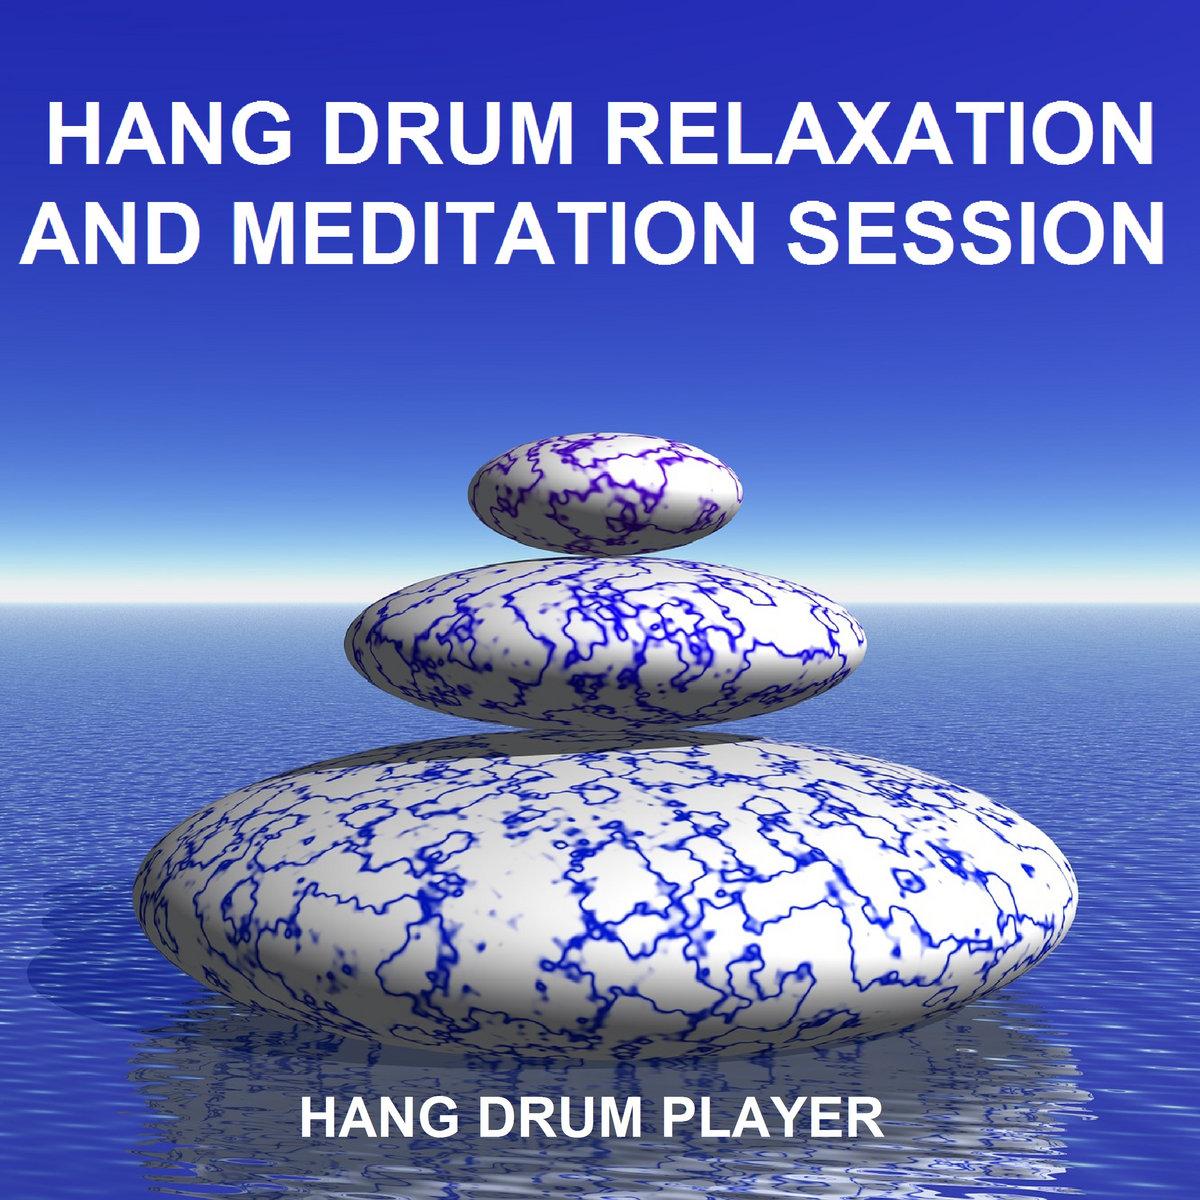 Chakras, Mudras And Mantras | Hang Drum Player